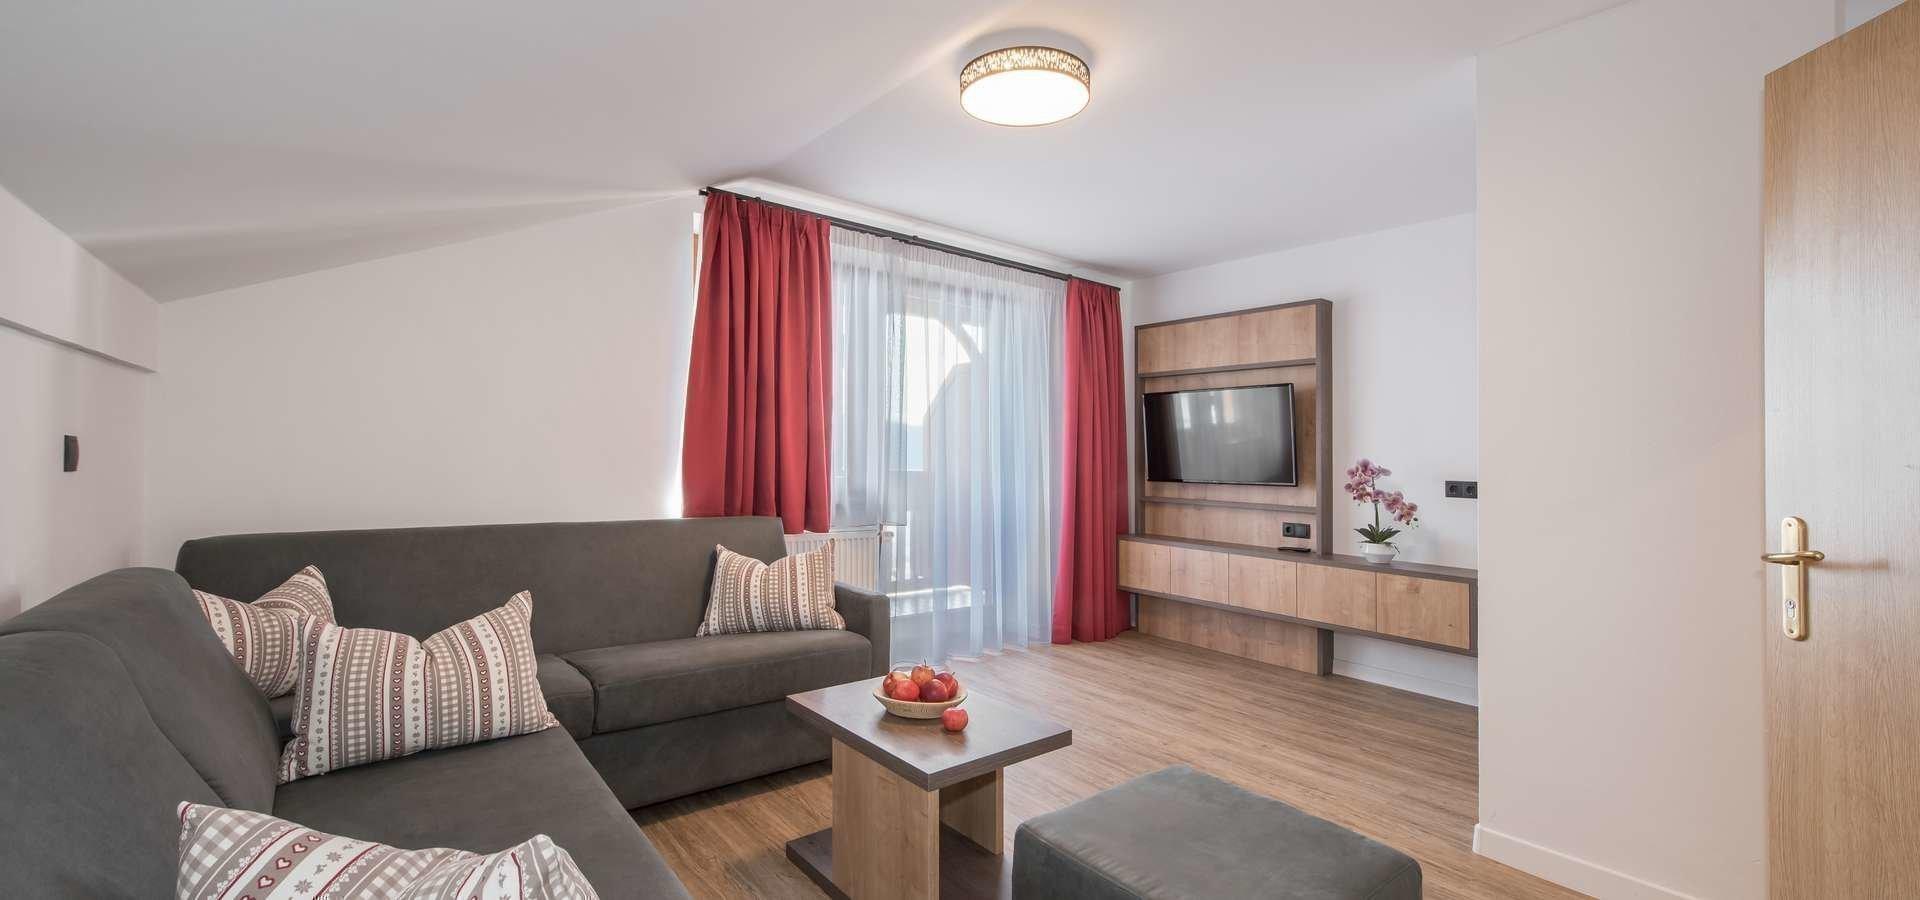 hotelzimmer-mesenhaus-suedtirol